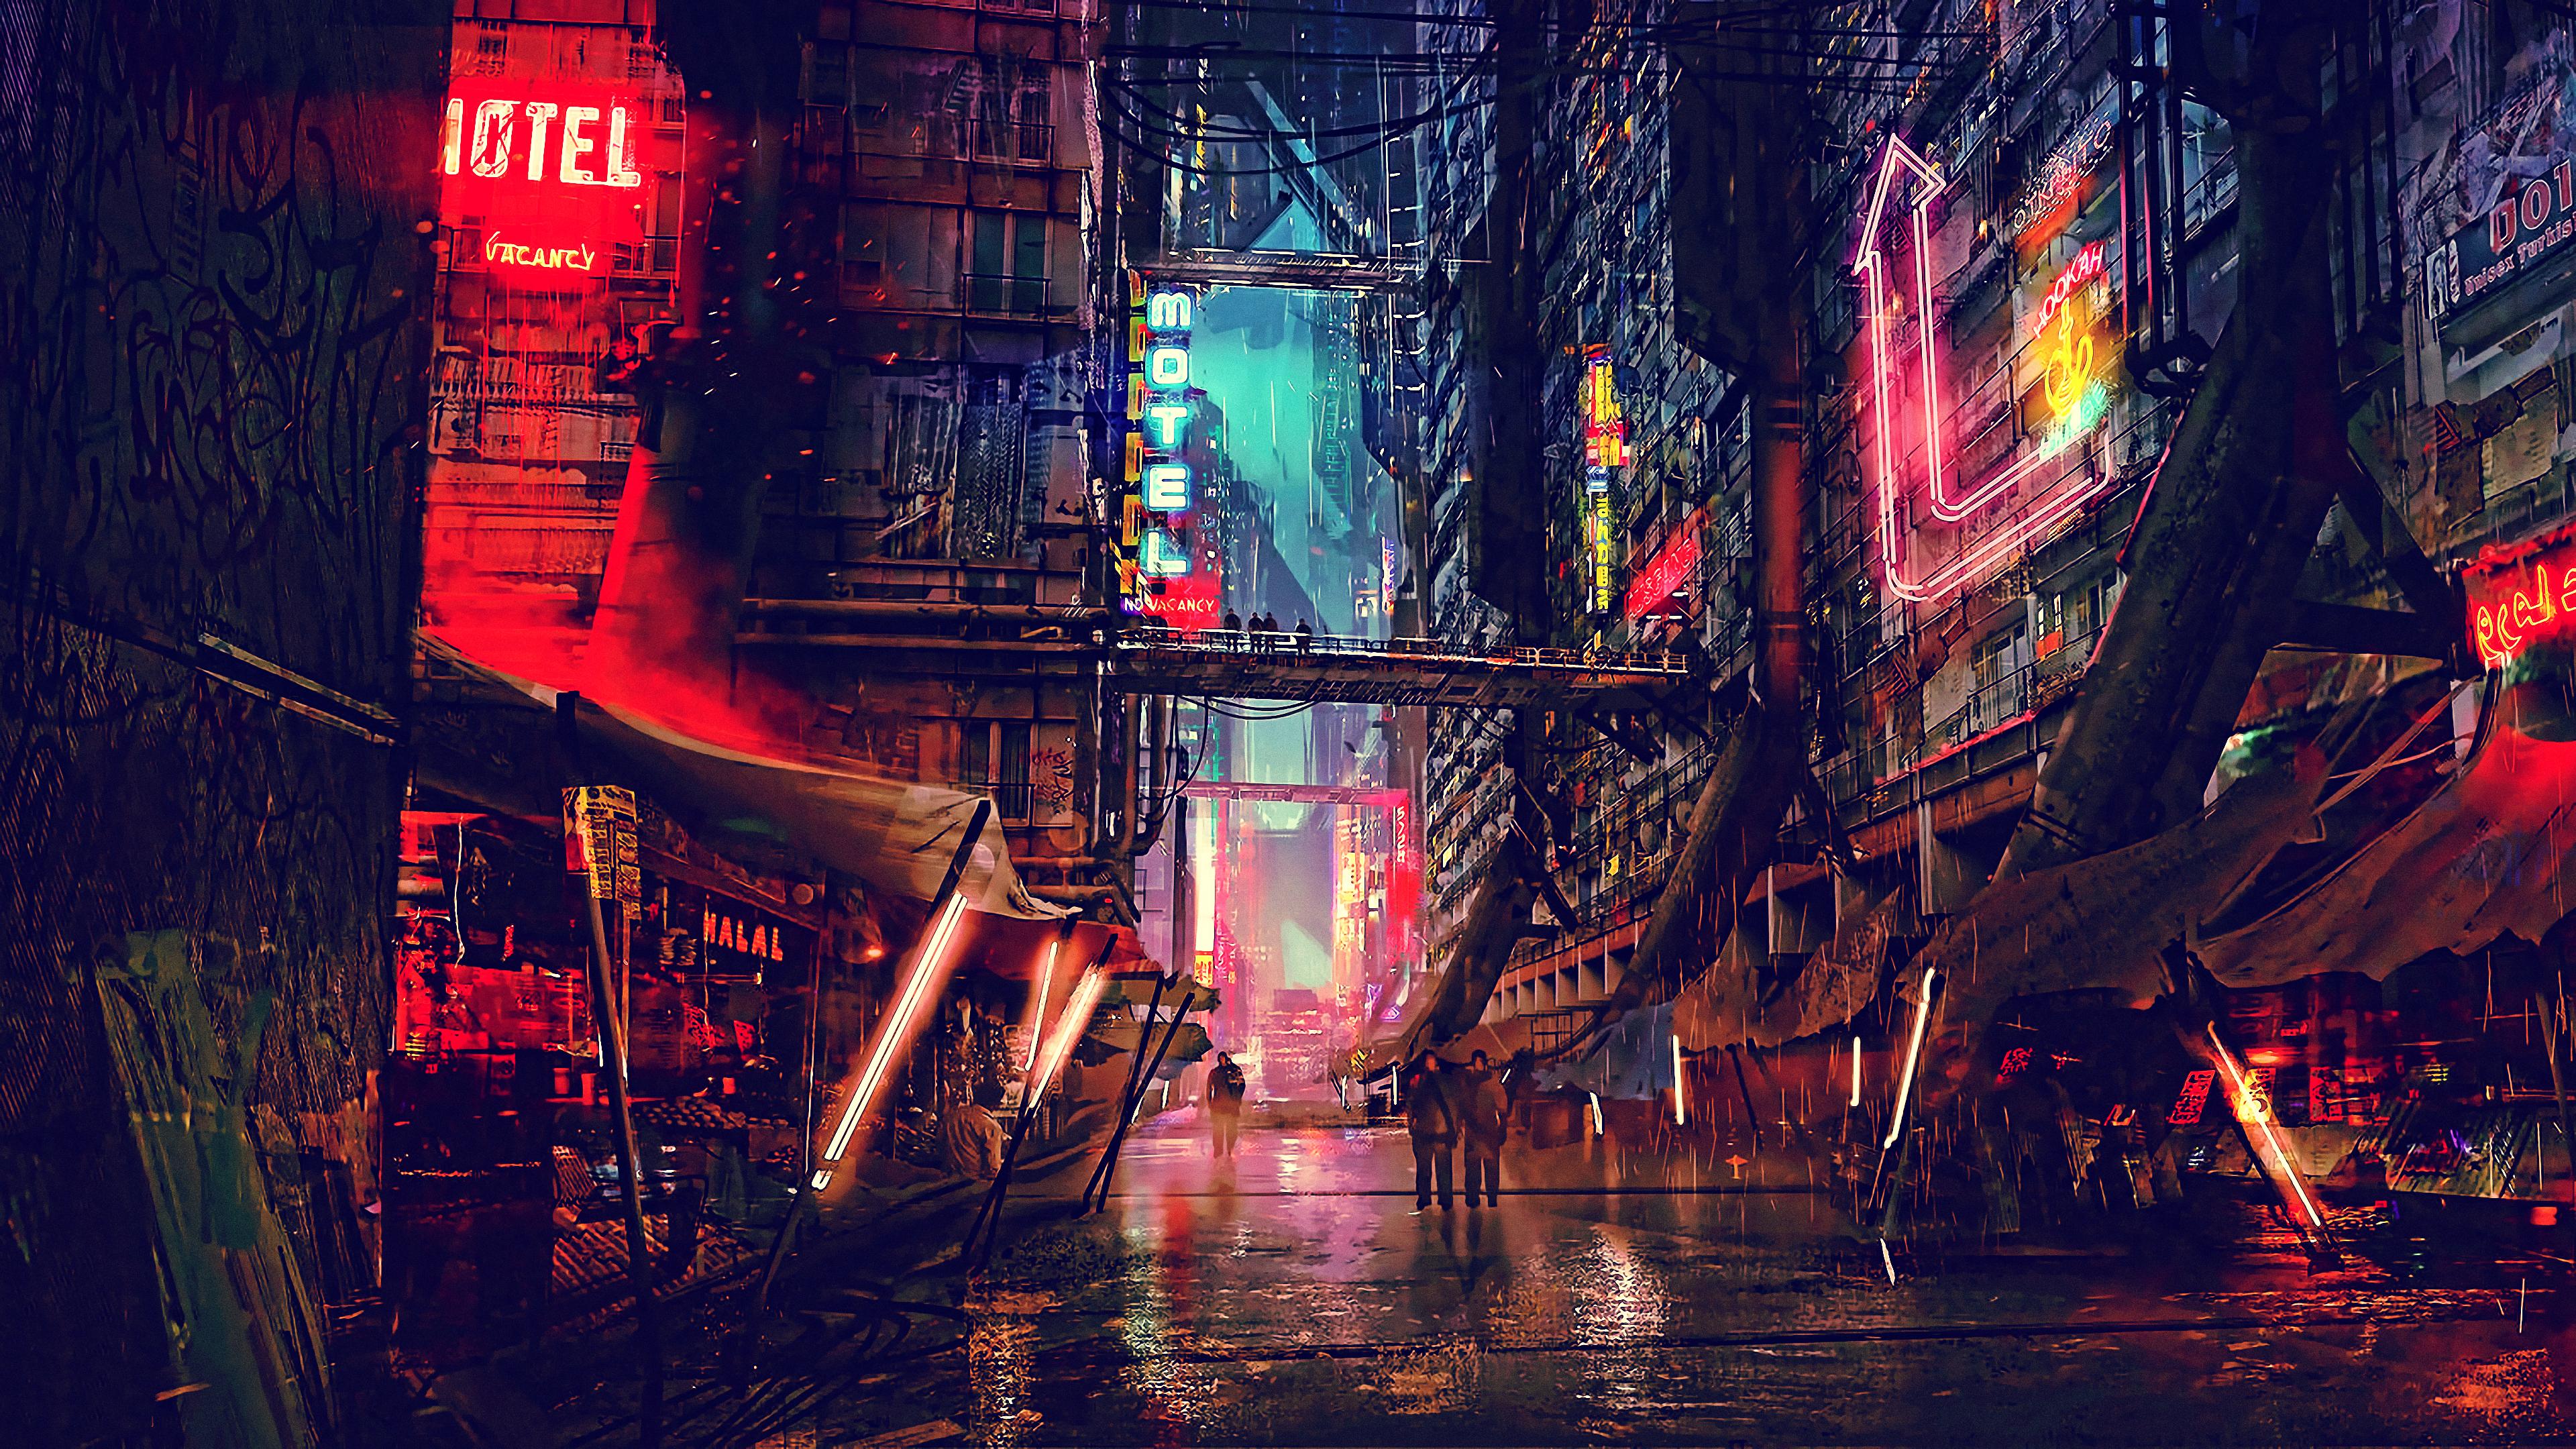 science fiction cyberpunk futuristic city digital art 4k 1540754826 - Science Fiction Cyberpunk Futuristic City Digital Art 4k - street wallpapers, science fiction wallpapers, lights wallpapers, hd-wallpapers, future wallpapers, digital art wallpapers, cyberpunk wallpapers, city wallpapers, artwork wallpapers, artist wallpapers, 4k-wallpapers